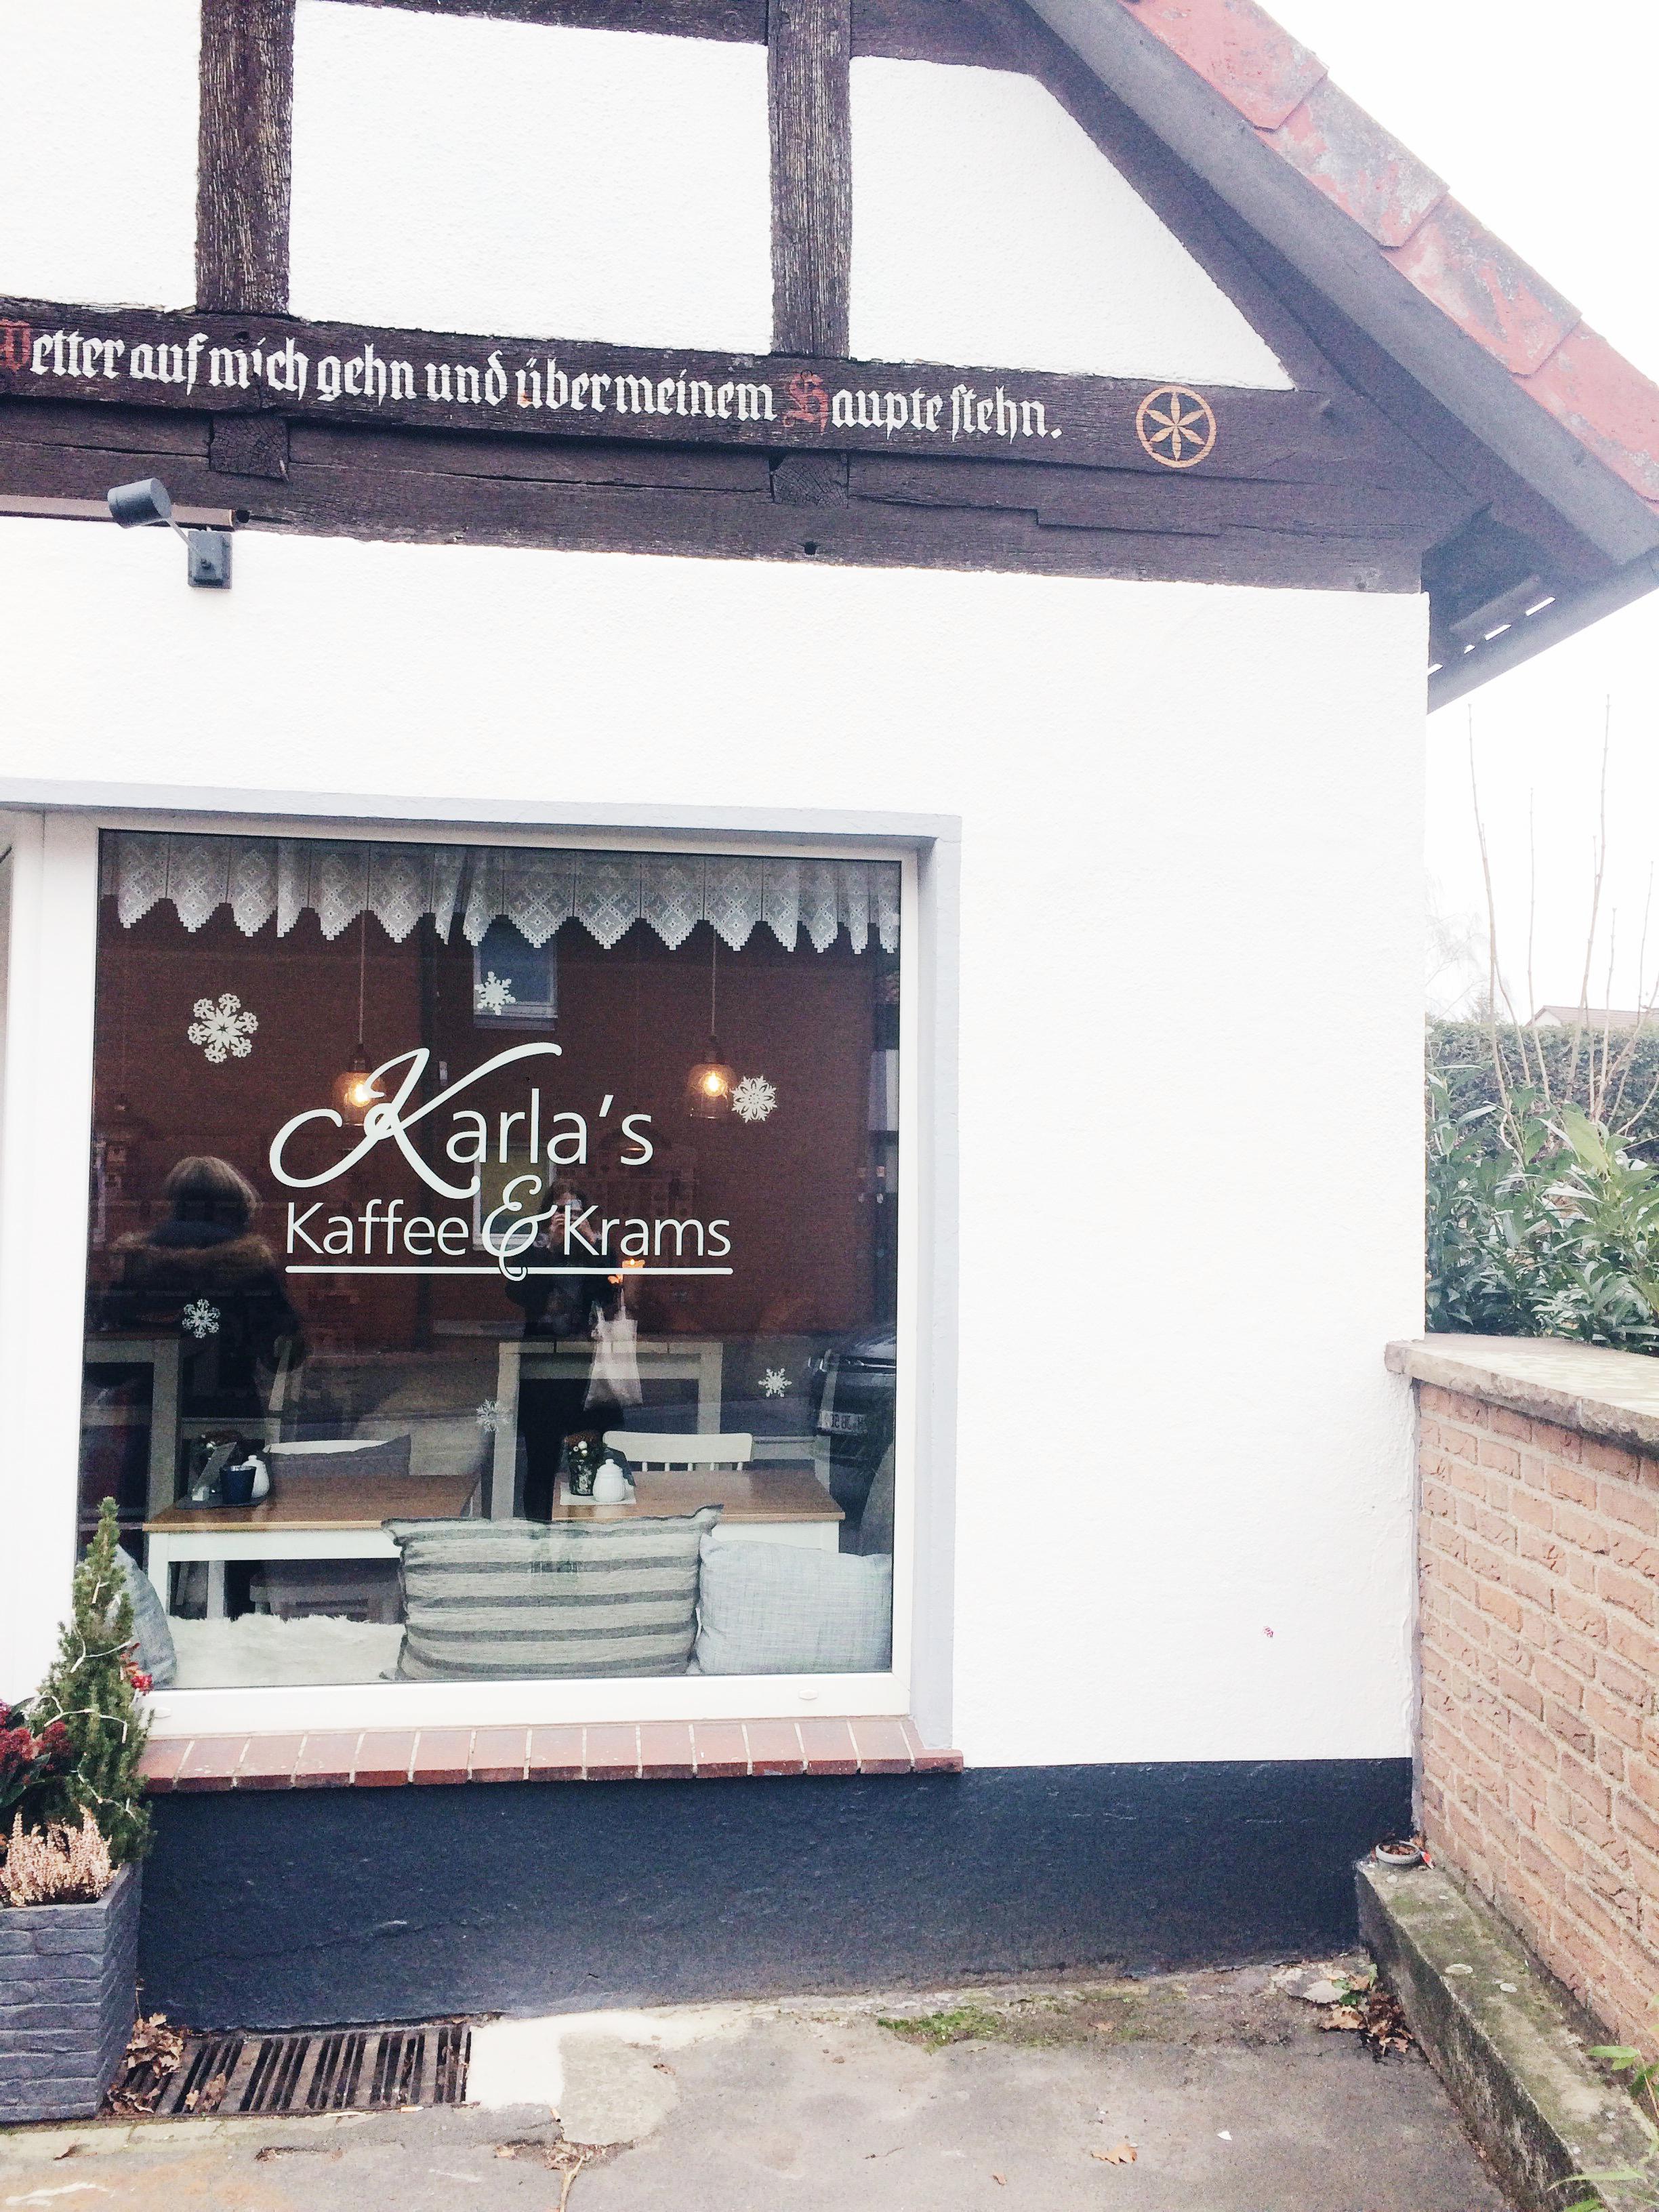 Karlas Kaffee & Krams